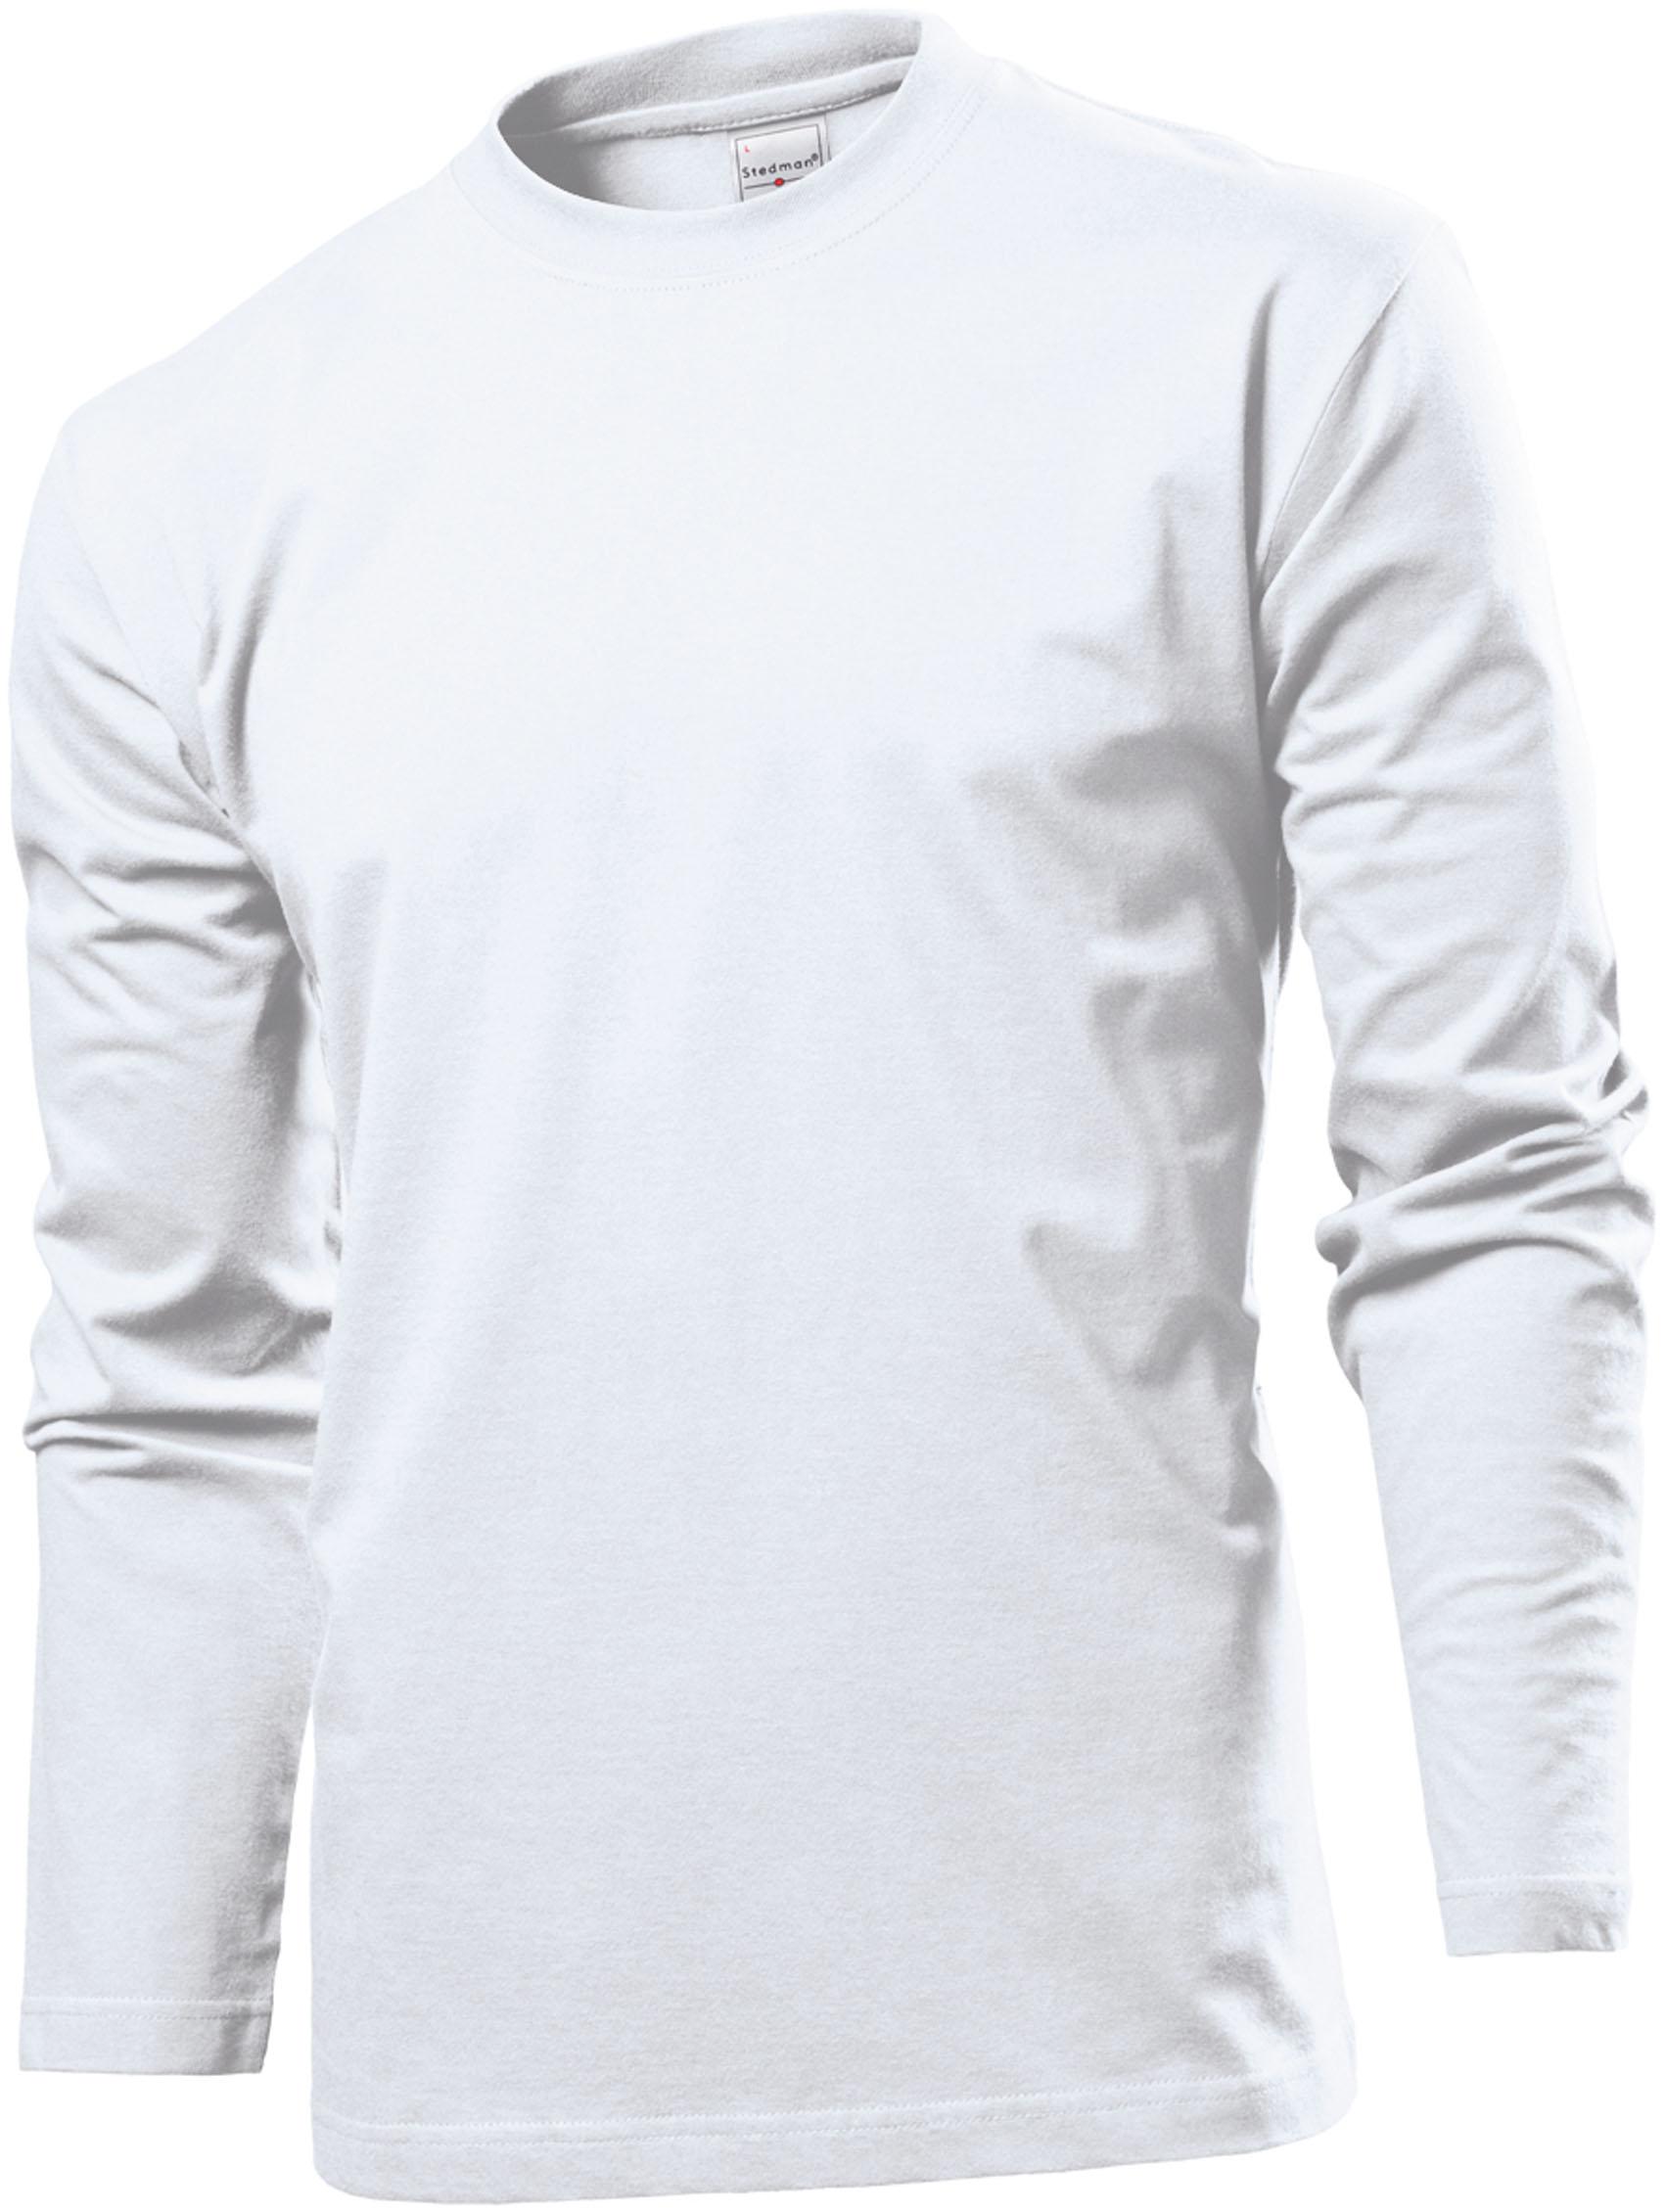 Stedman T-shirt Comfort-T LS for him